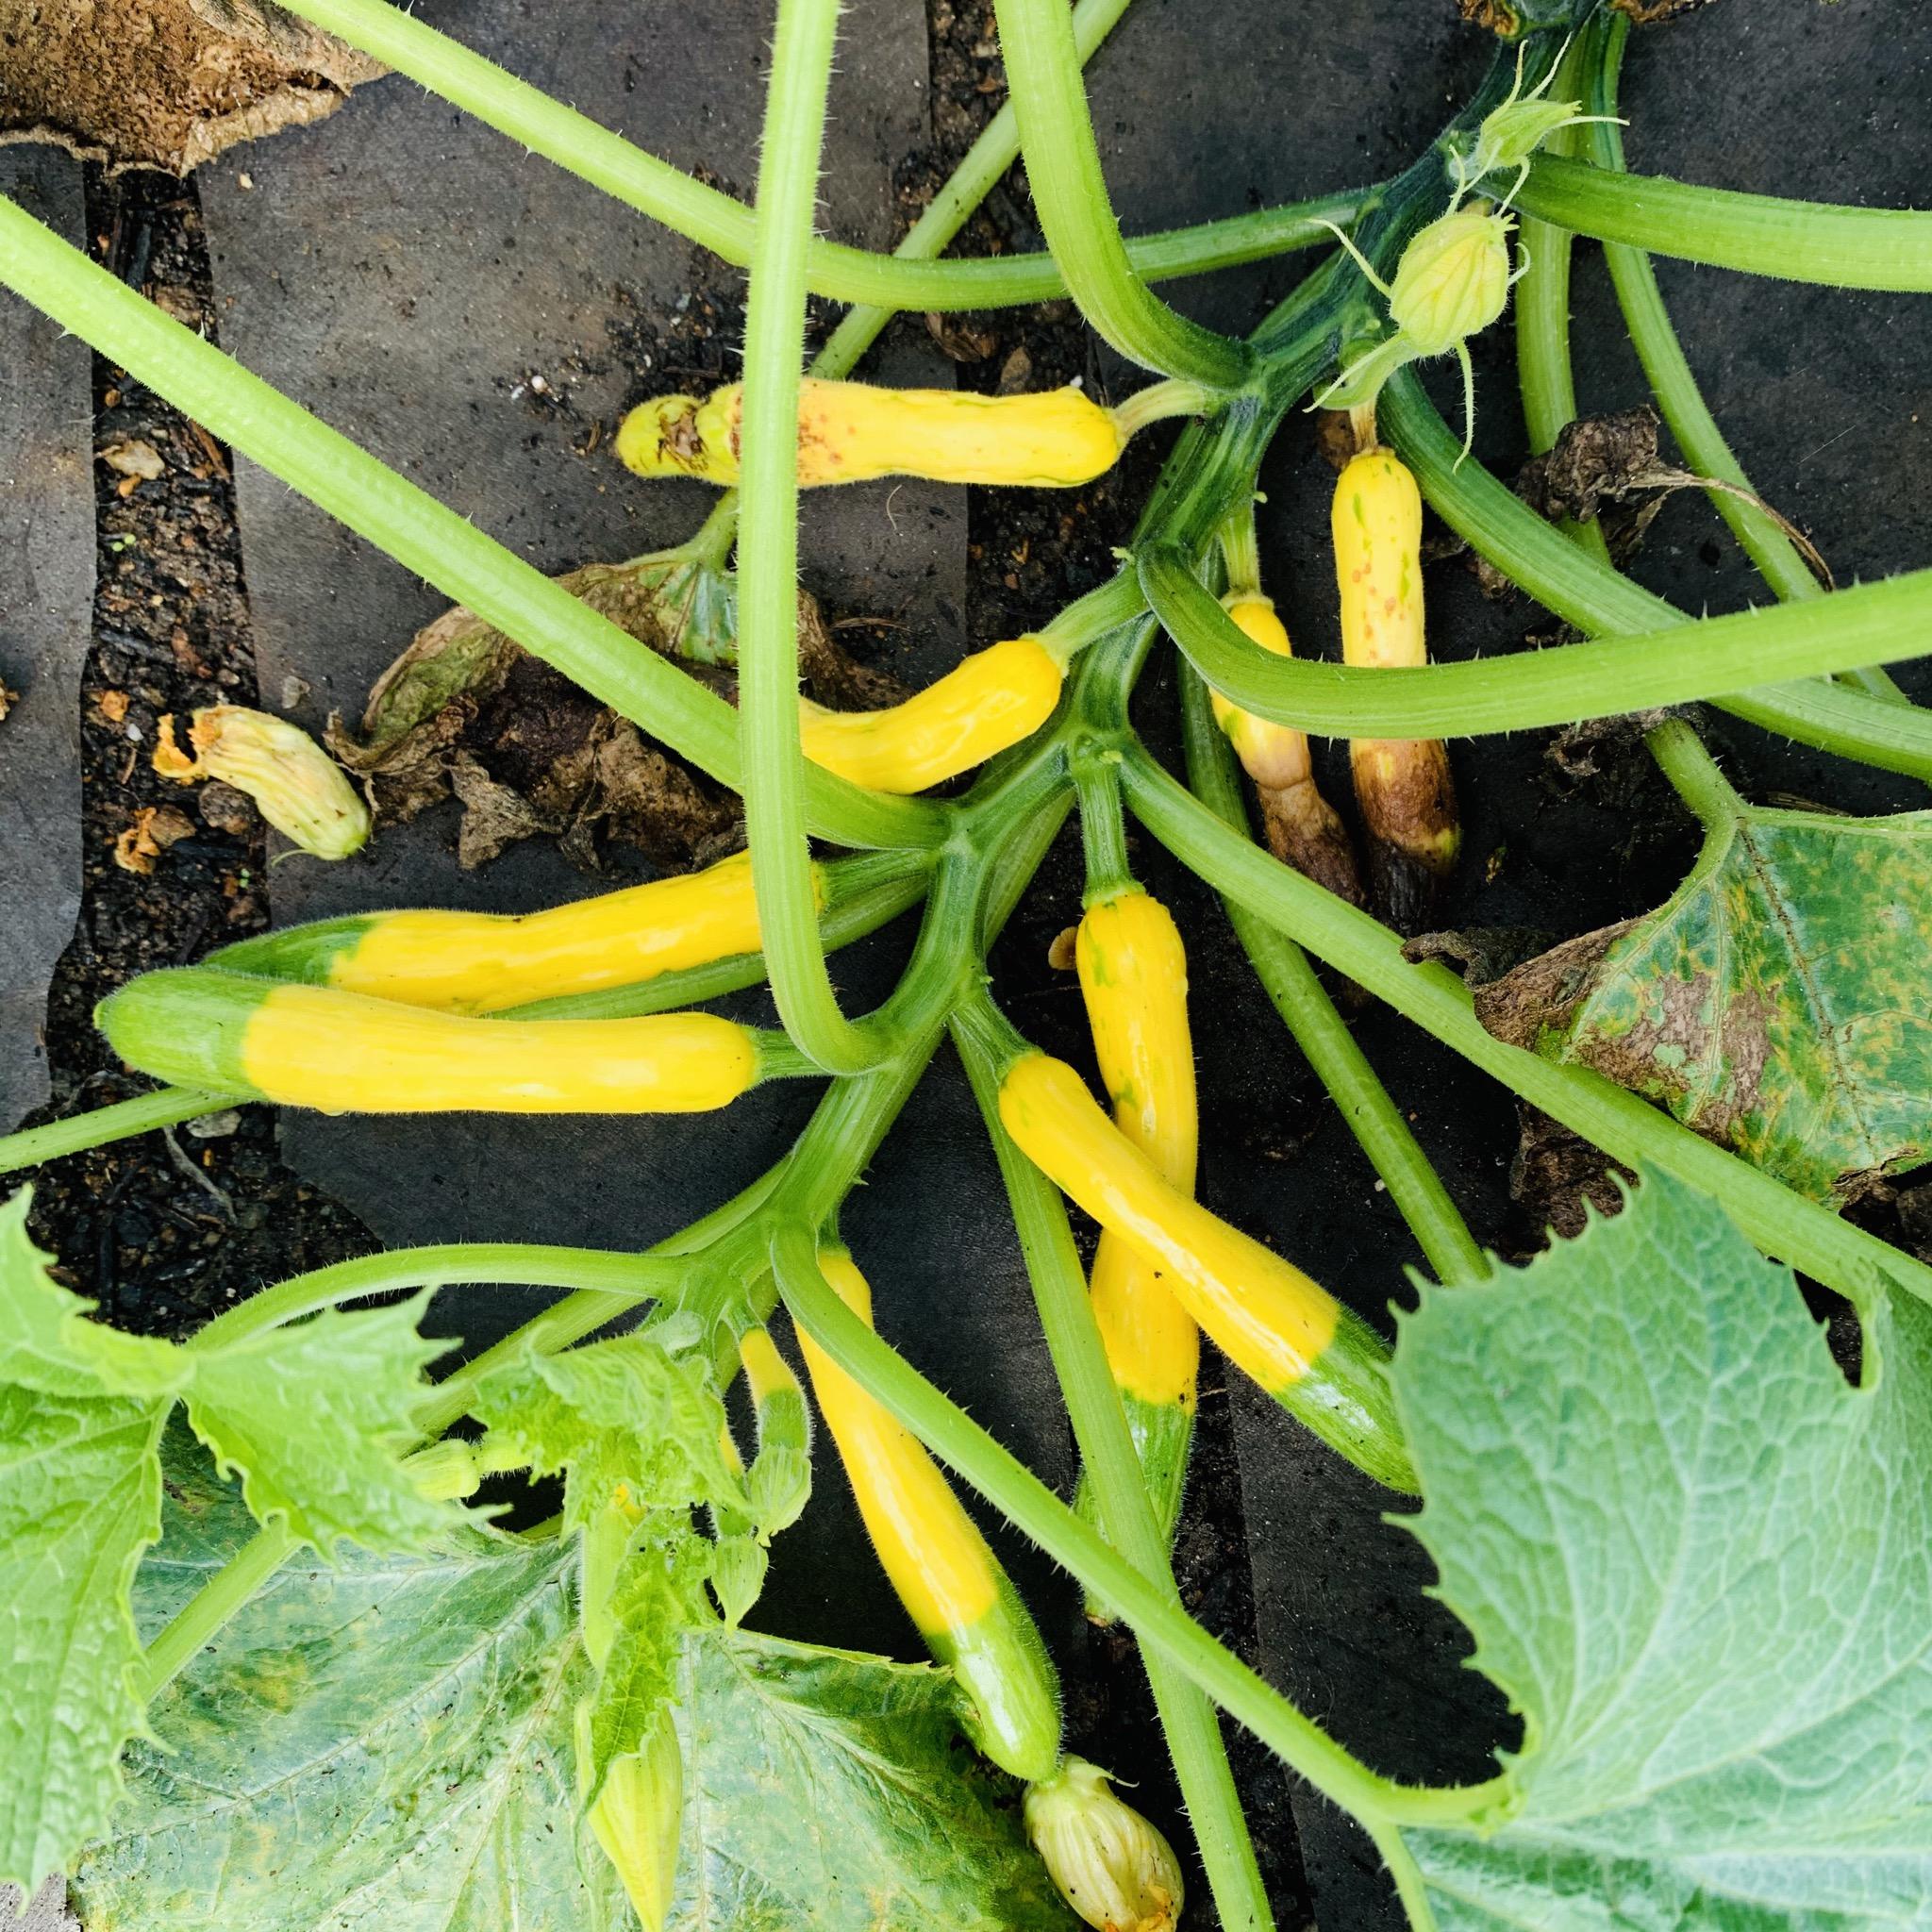 F0847E5B 2AEE 40E7 A257 A873D660D3CF The garden is still producing